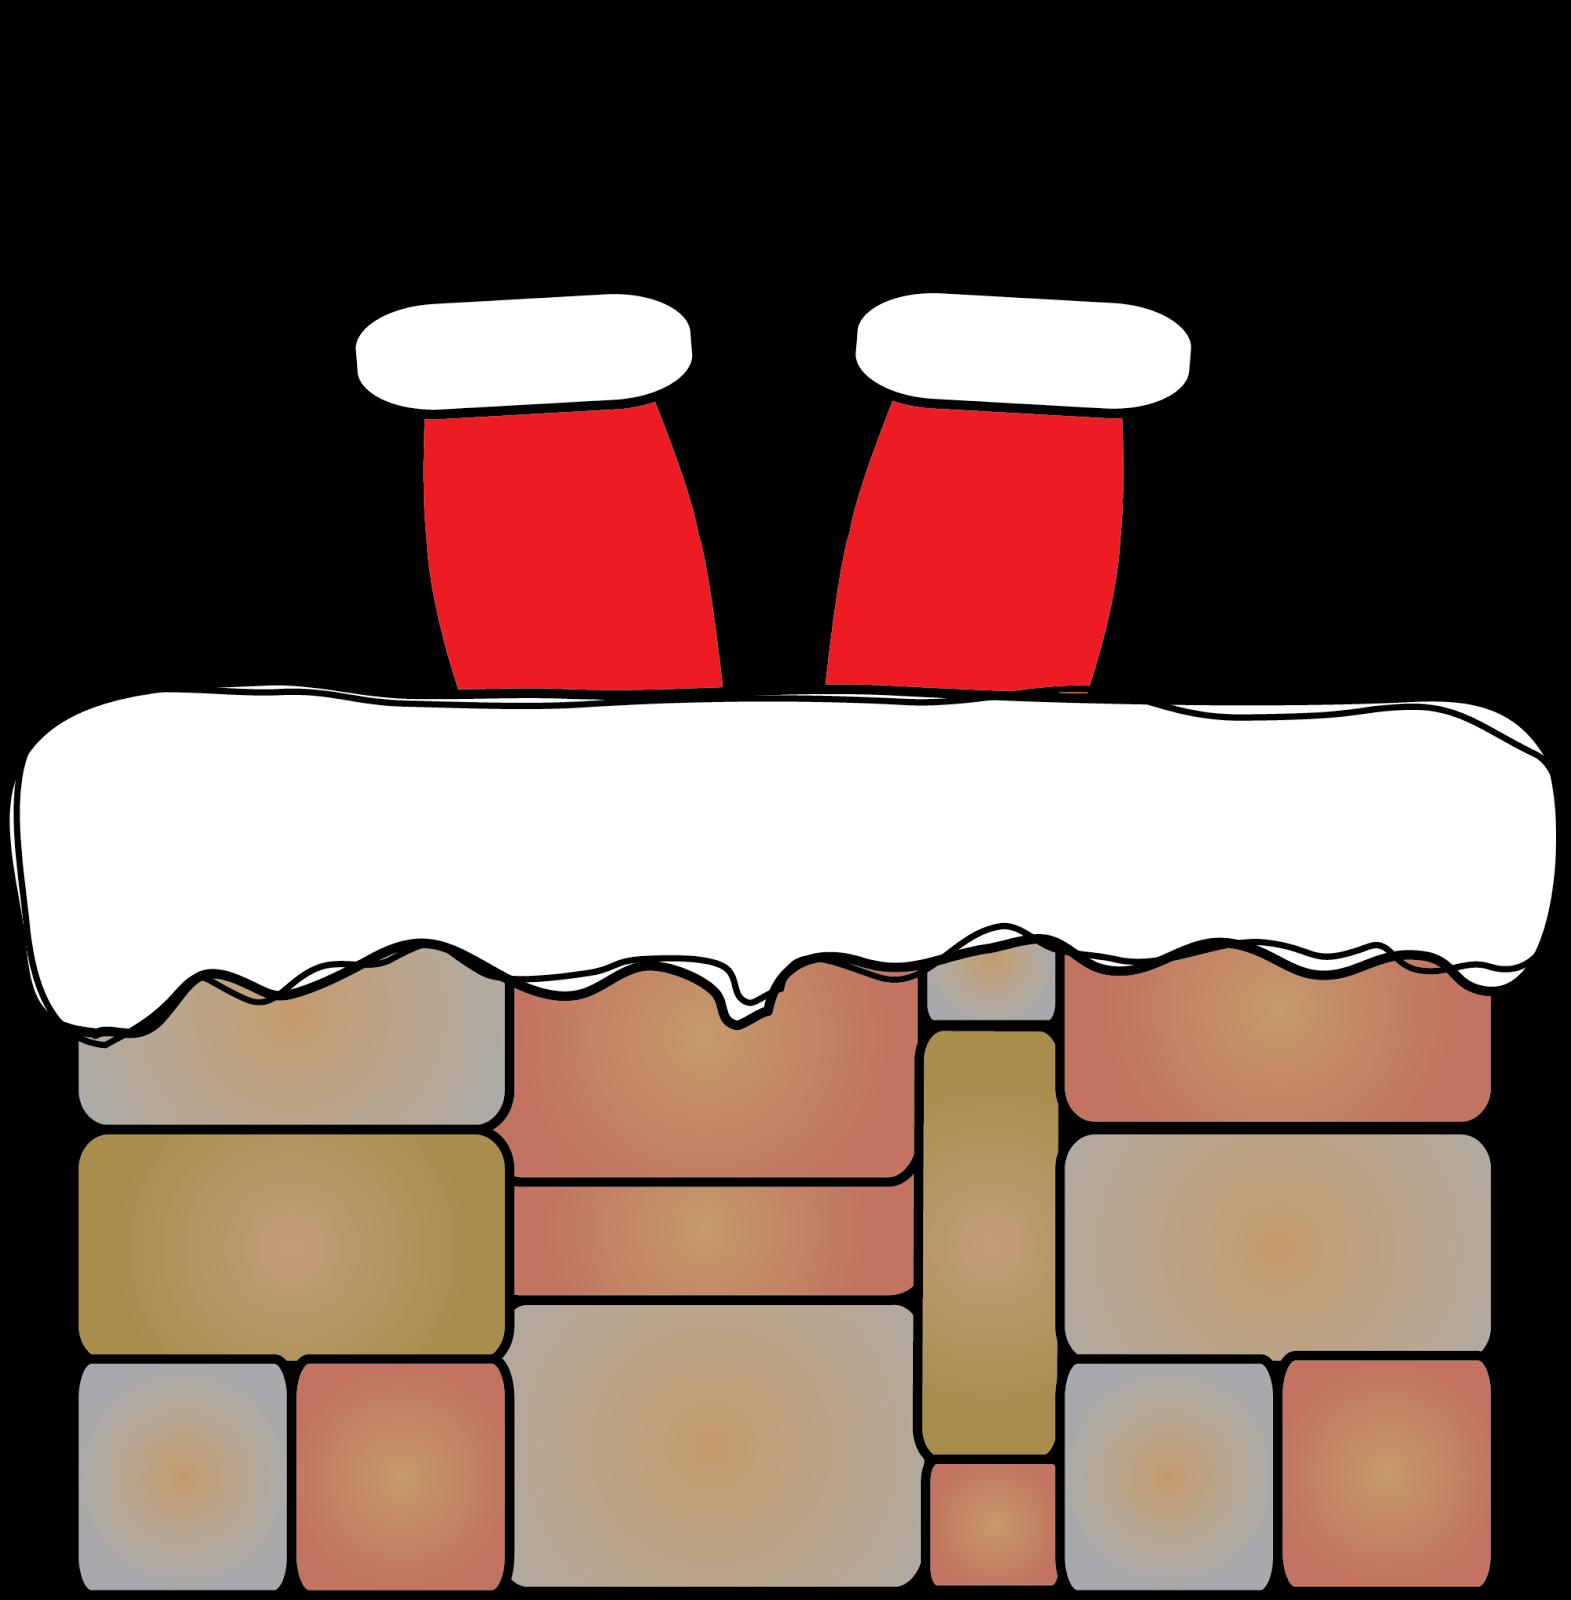 Santa Stuck In Chimney Clipart · Donu0027t Get Stuck! Freebies and More! - Santa Chimney PNG HD